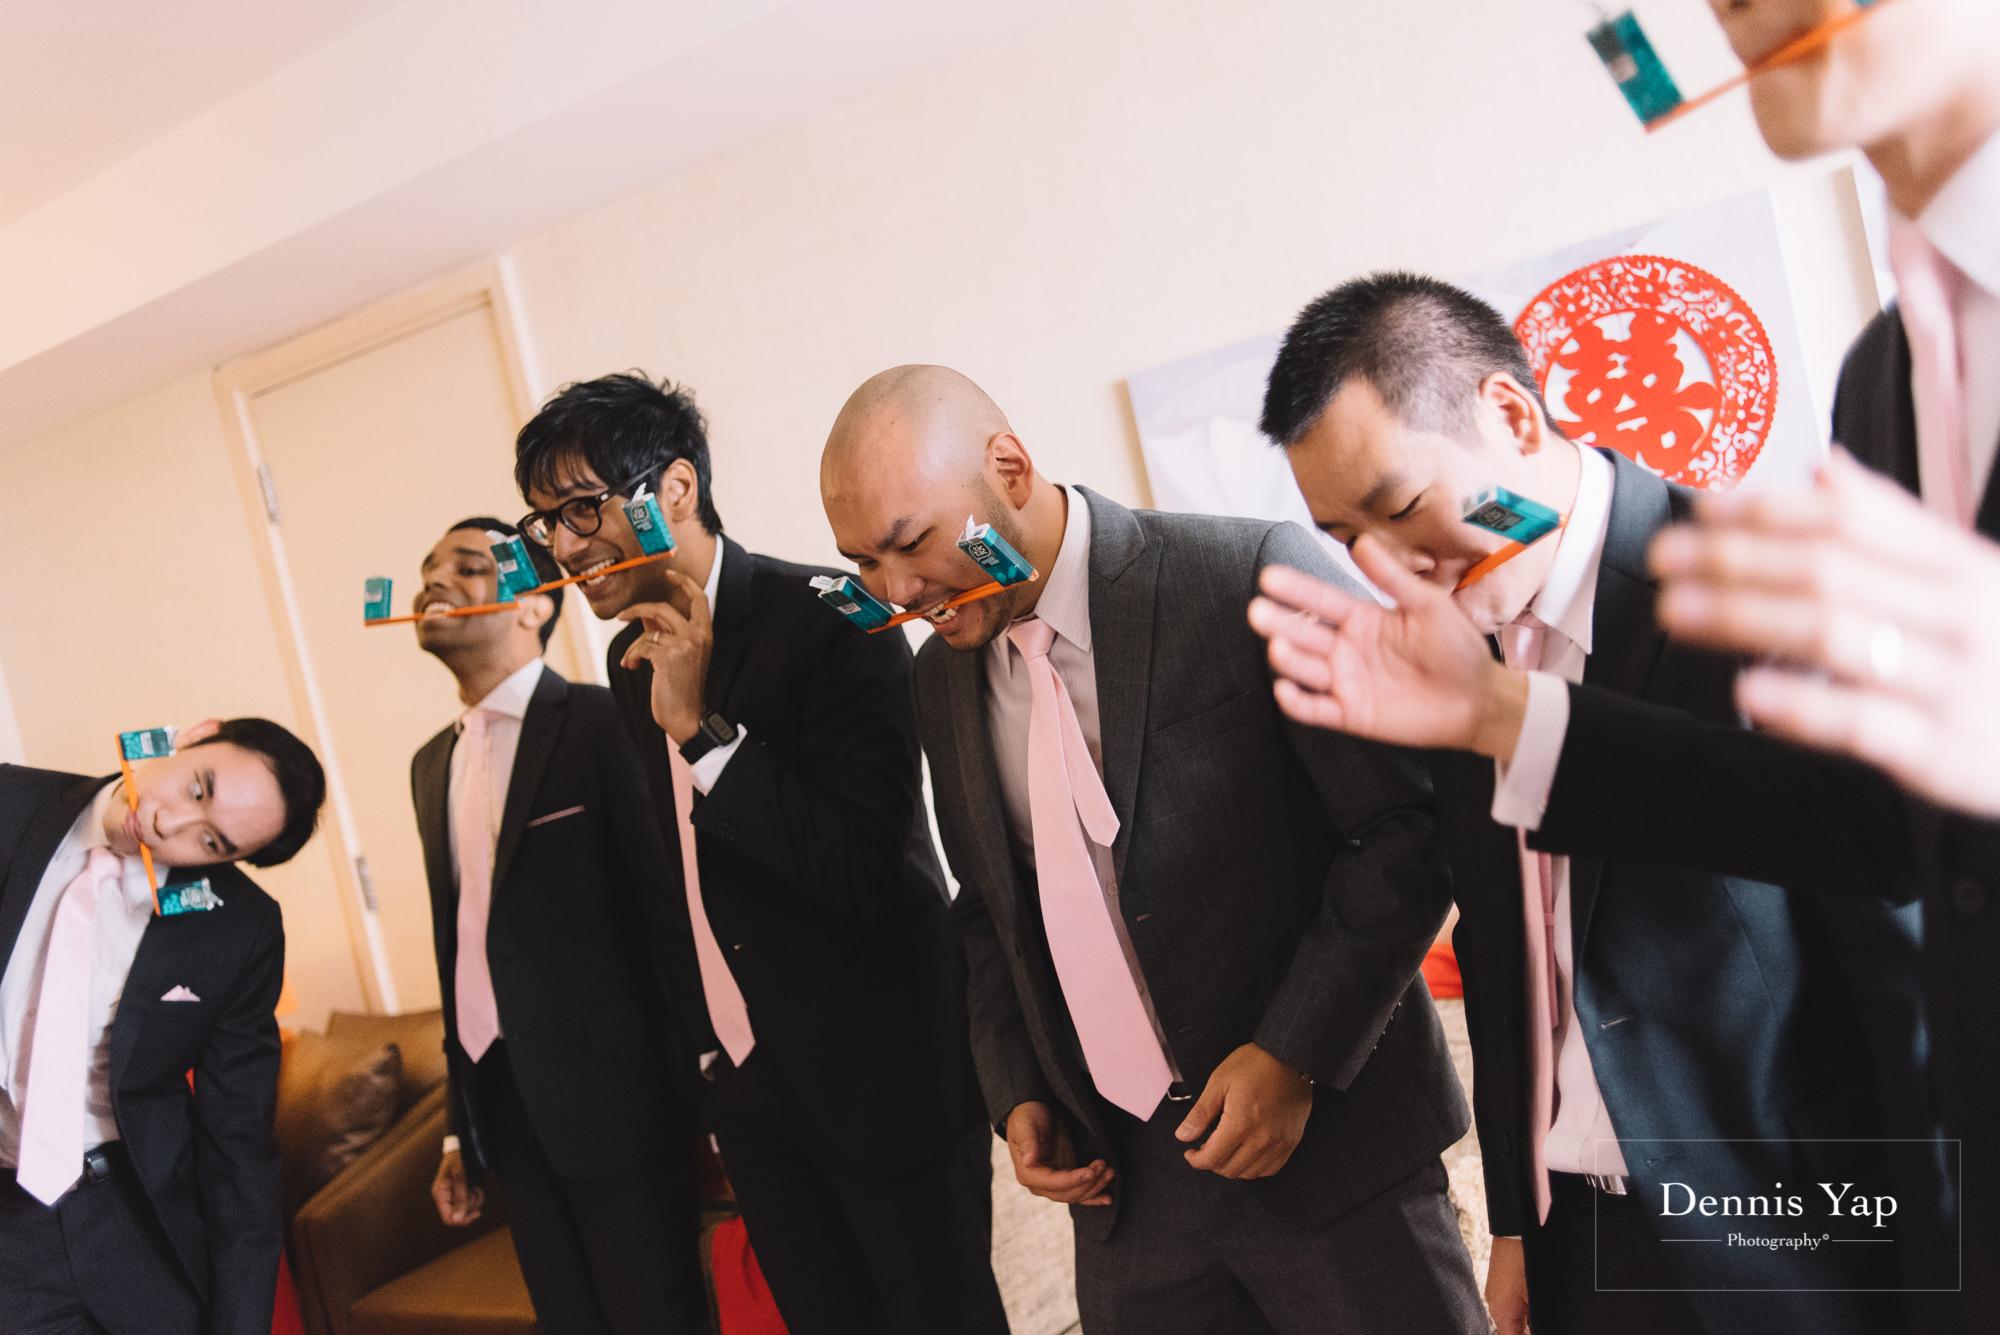 han sen ce pei wedding day A loft hotel kuala lumpur dennis yap photography-11.jpg